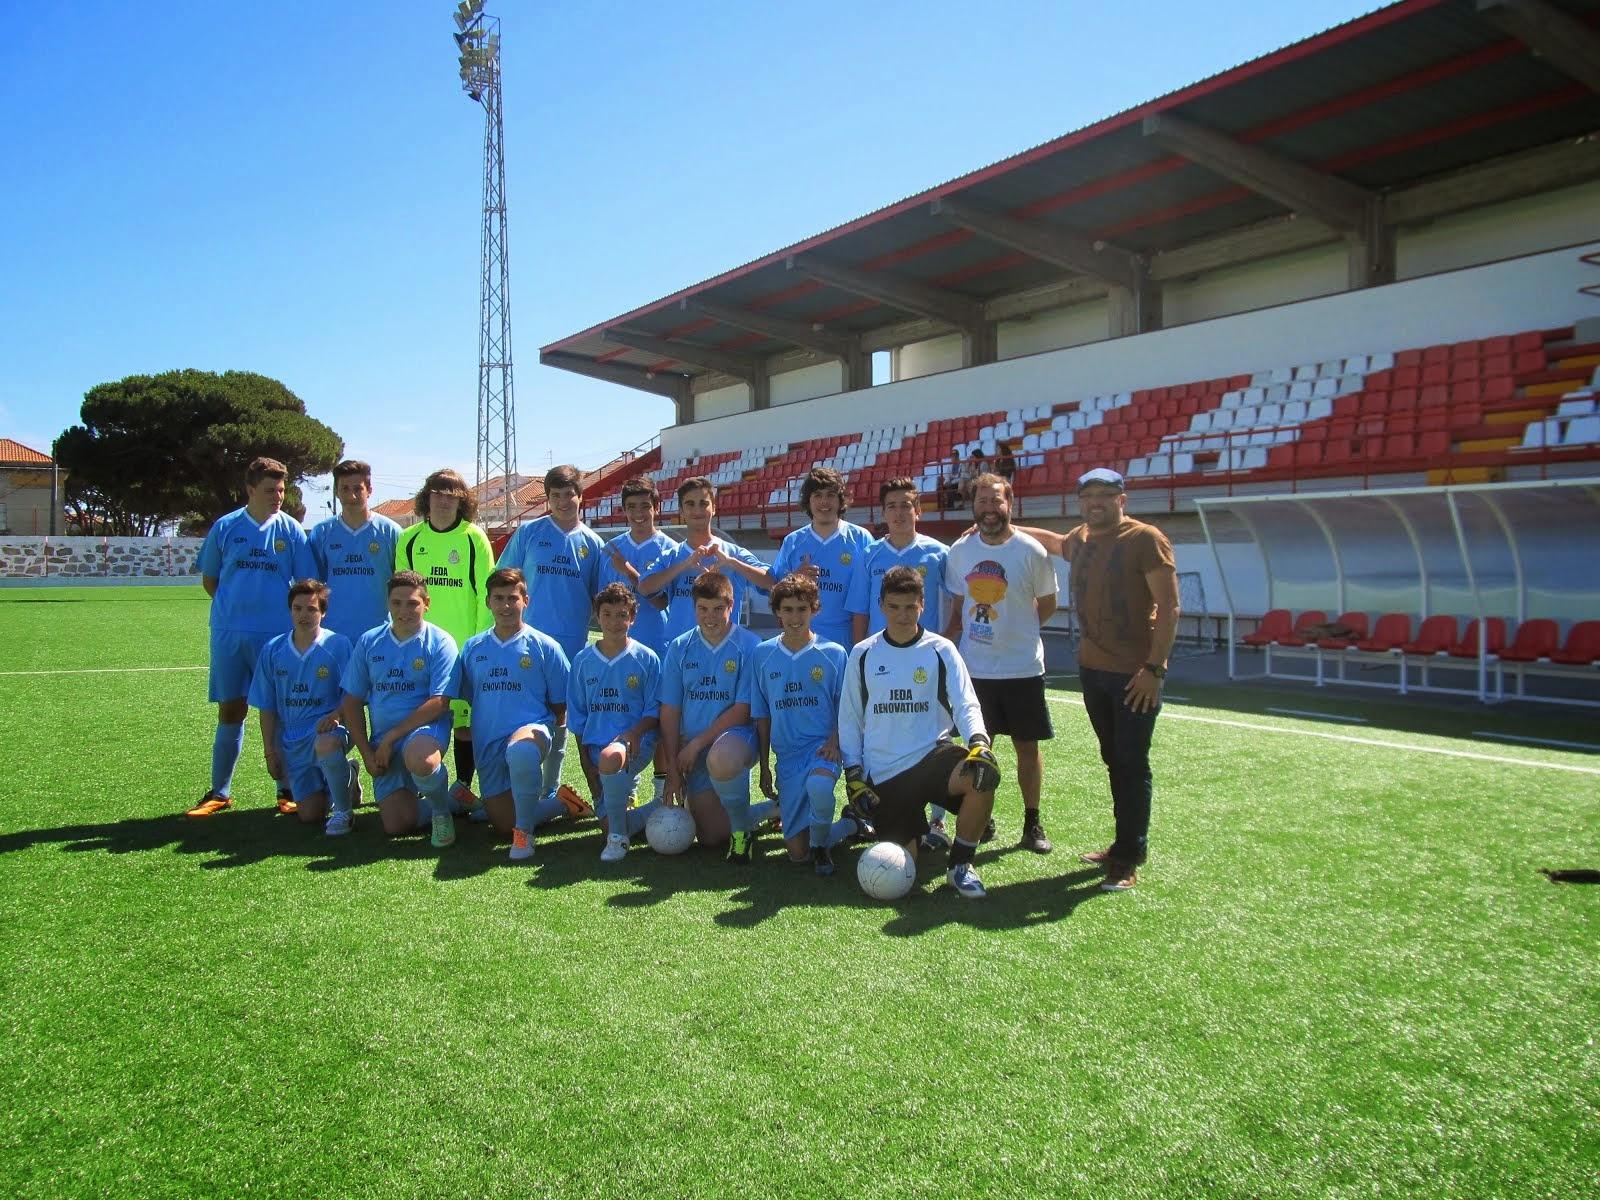 Juvenis Belinho 2013/14